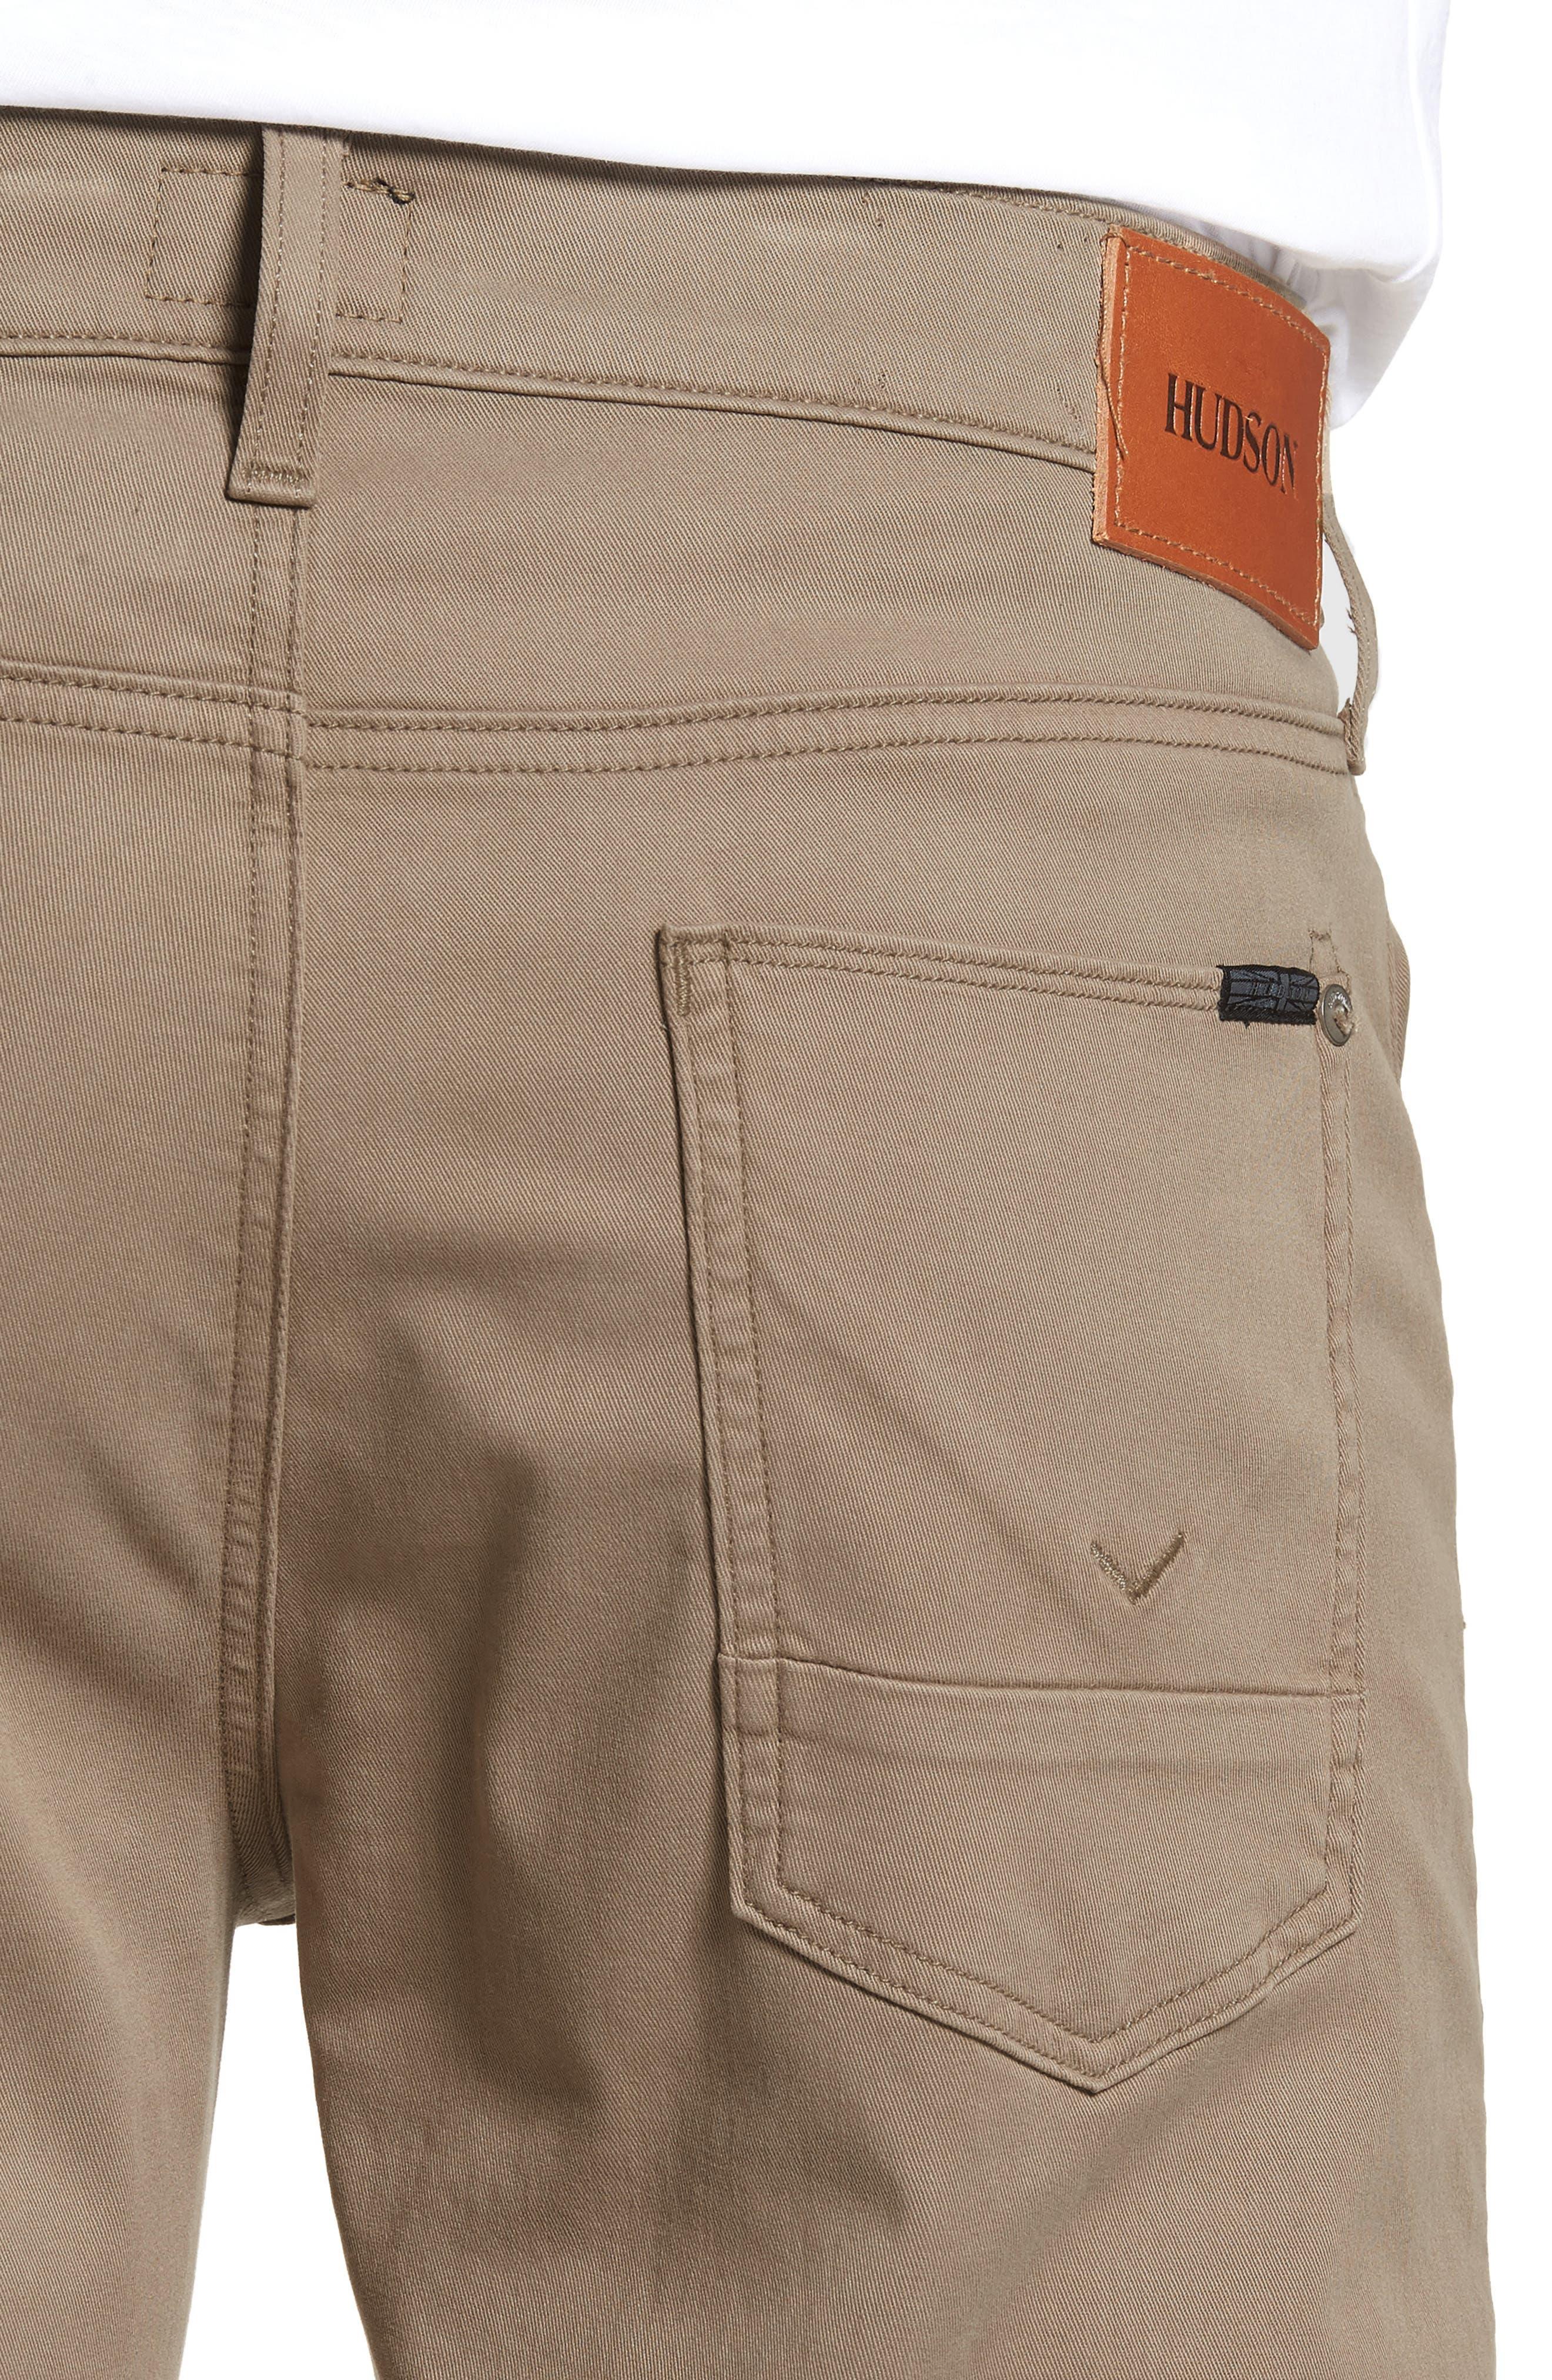 Byron Slim Straight Leg Pants,                             Alternate thumbnail 4, color,                             250